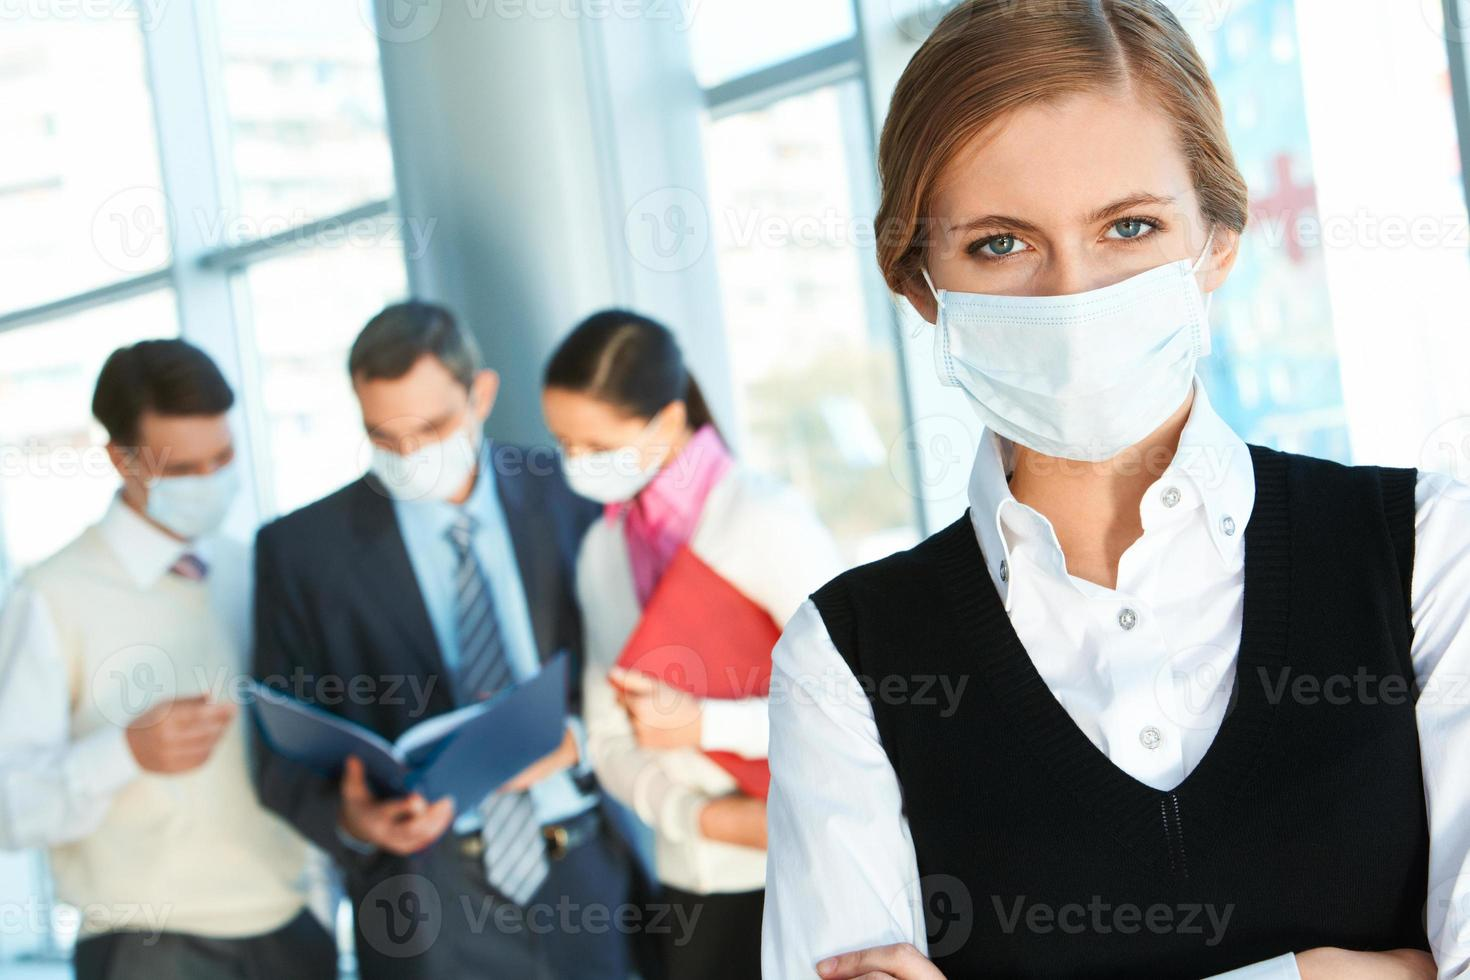 Grippegefahr foto